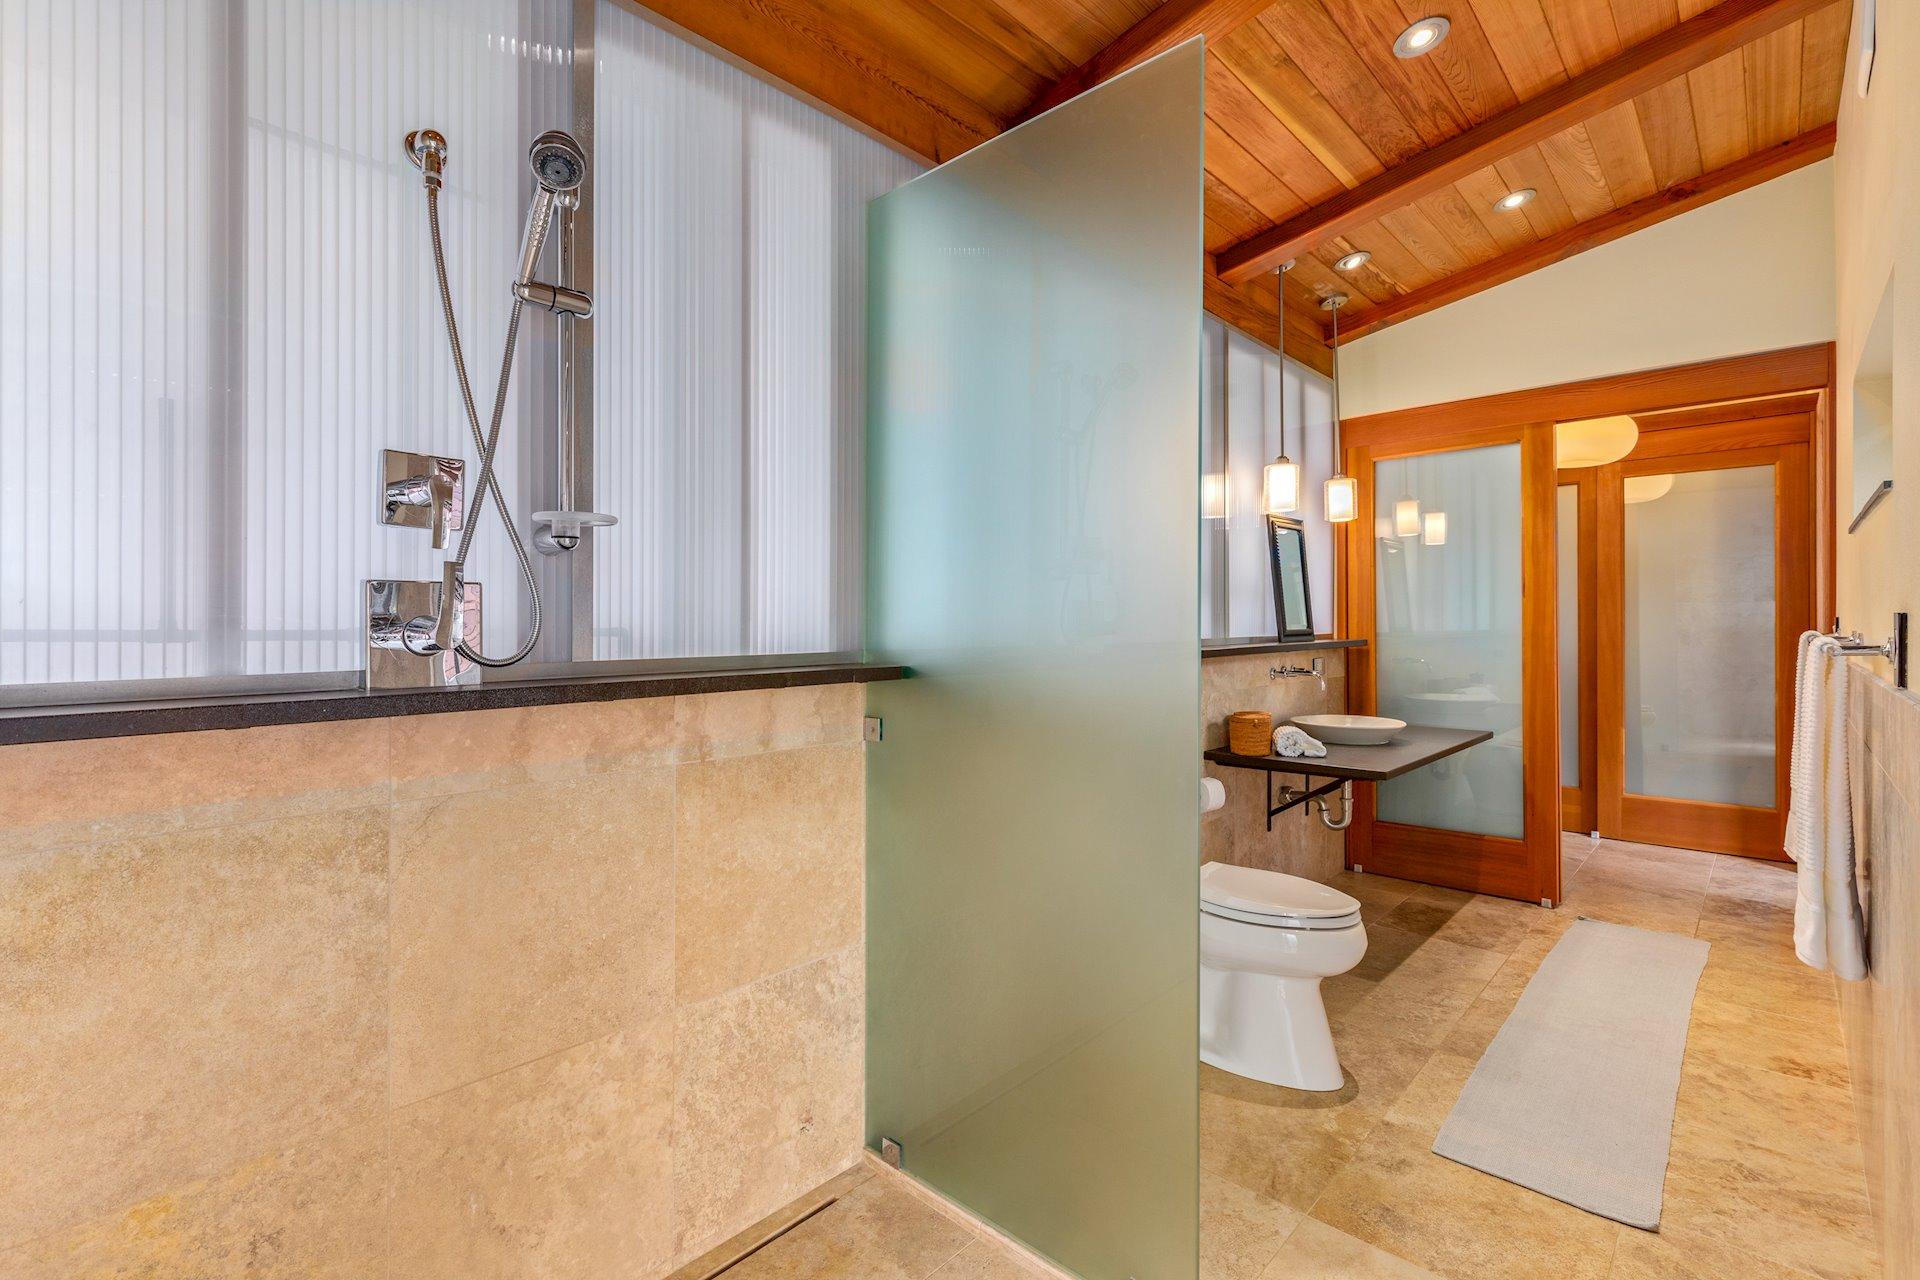 Master bathroom/wetroom